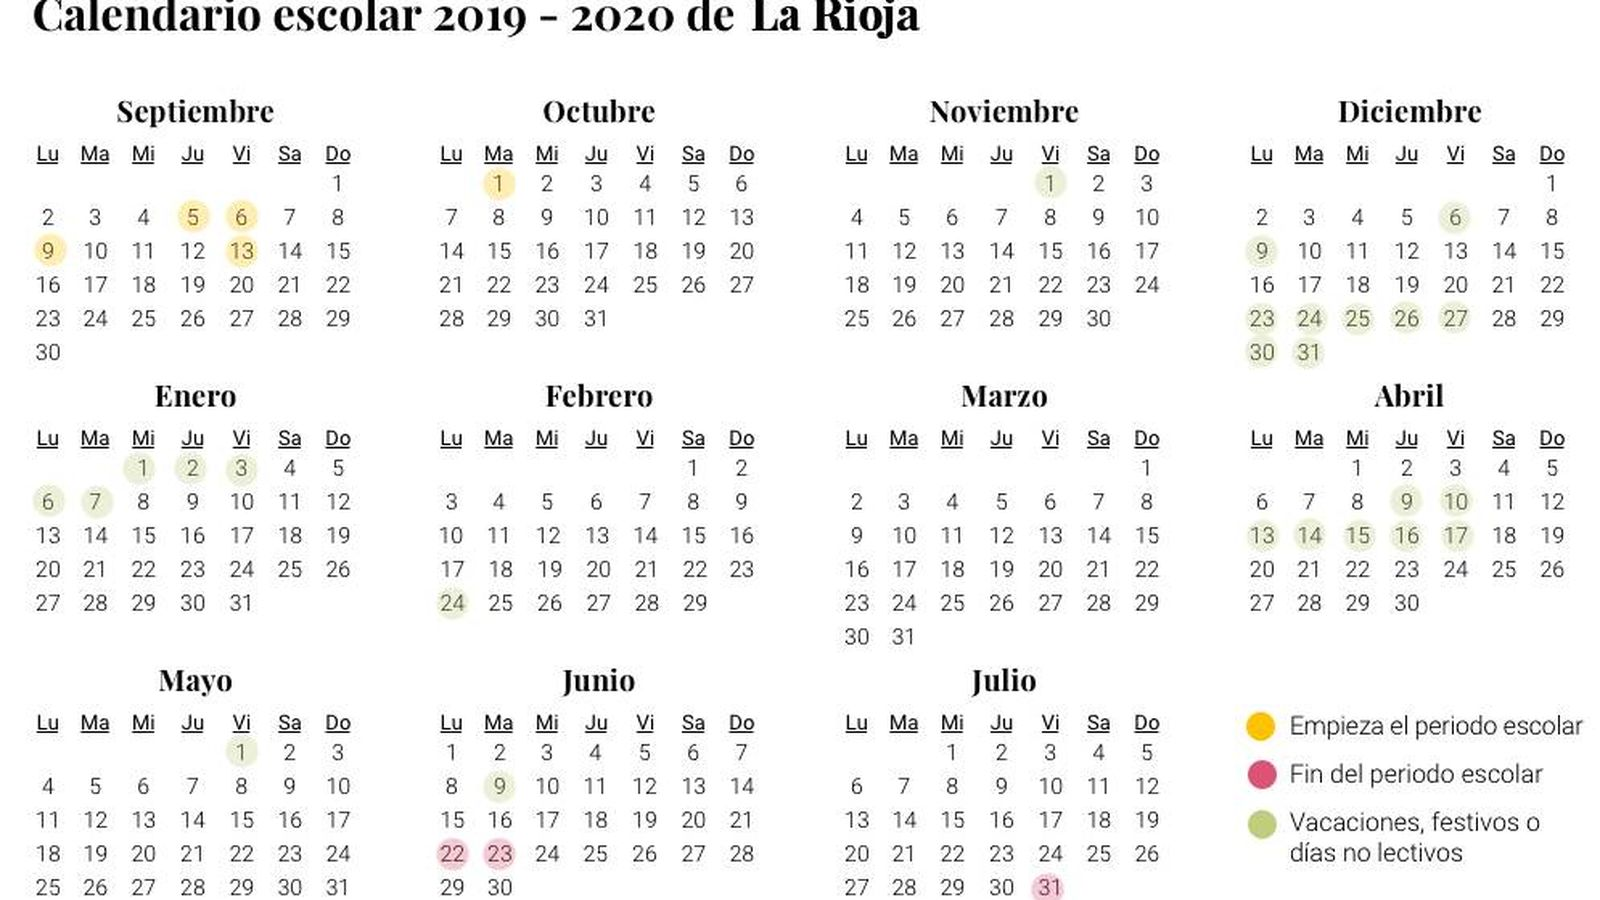 Calendario 2020 Con Festivos Andalucia.Calendario Escolar 2019 2020 En La Rioja Vacaciones